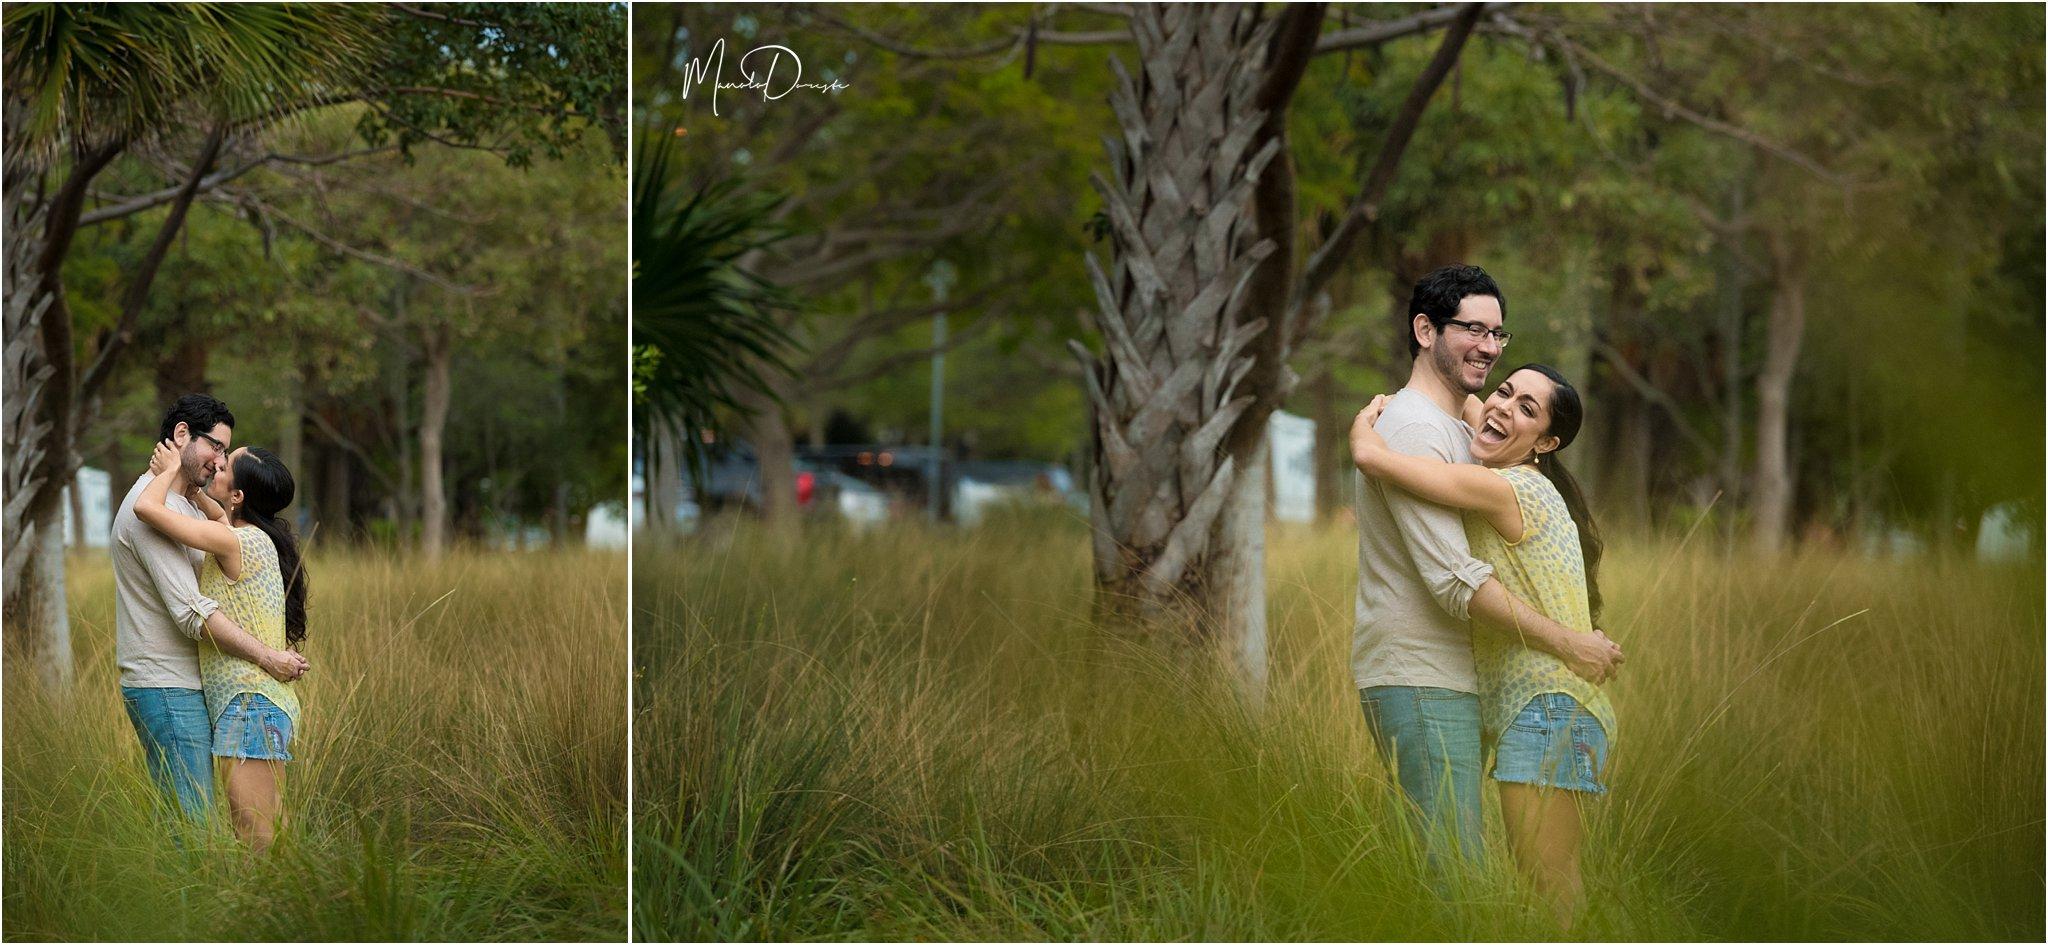 00779_ManoloDoreste_InFocusStudios_Wedding_Family_Photography_Miami_MiamiPhotographer.jpg